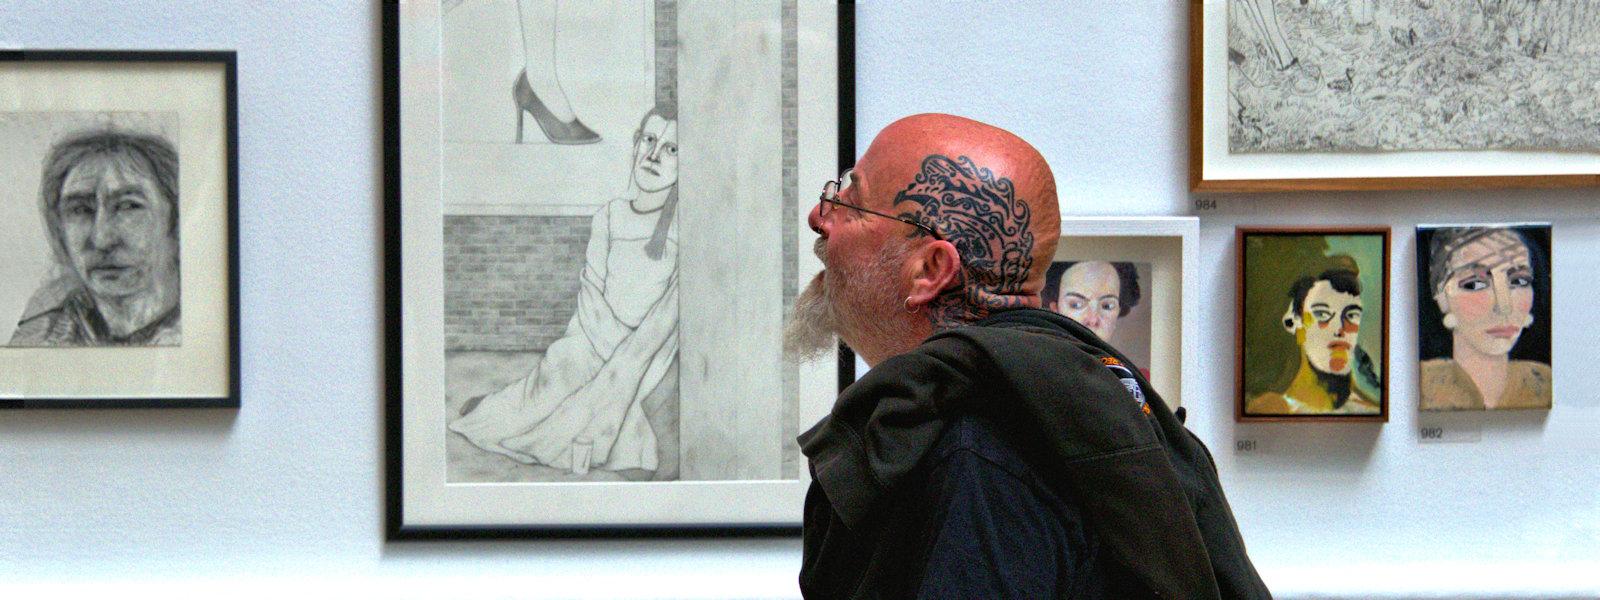 """Life Imitating Art"", Summer Exhibition, Royal Academy of Art, London, UK"